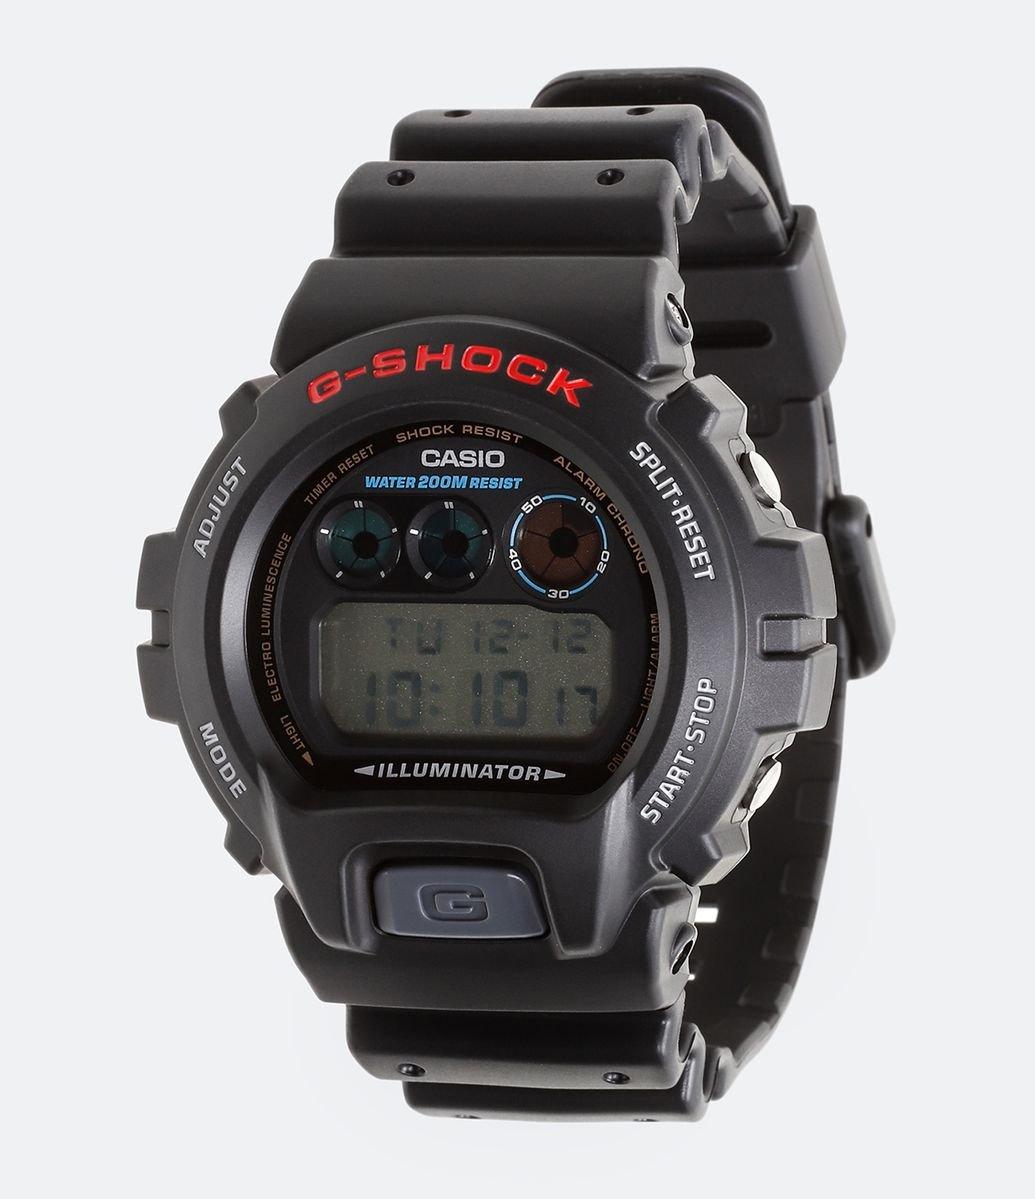 906b846e5d4 Relógio Masculino G-Shock Casio DW-6900-1VDR Digital - Renner